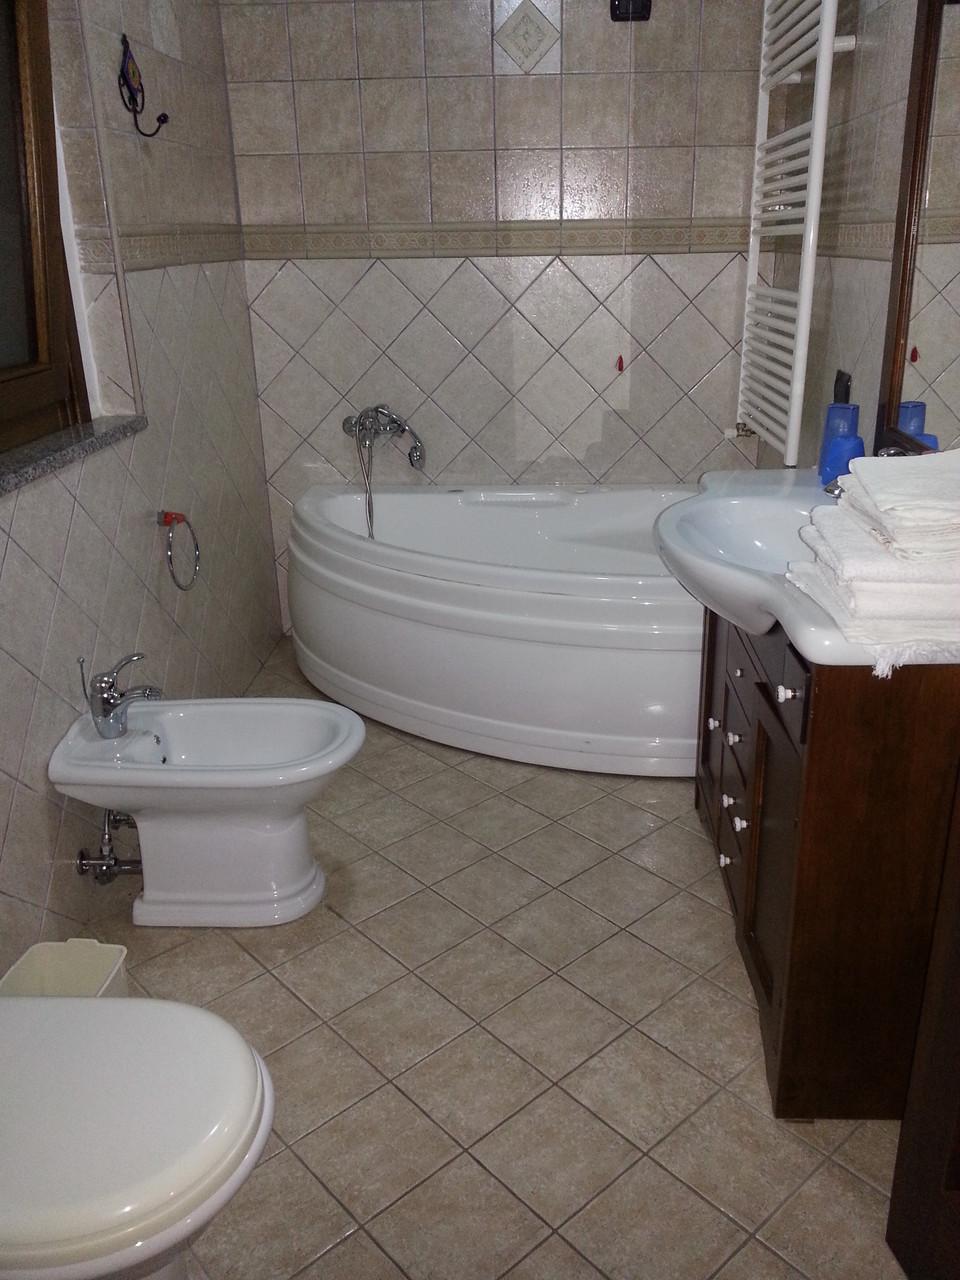 P2 bagno (vaso, bidet, lavandino, vasca idro, doccia separata)